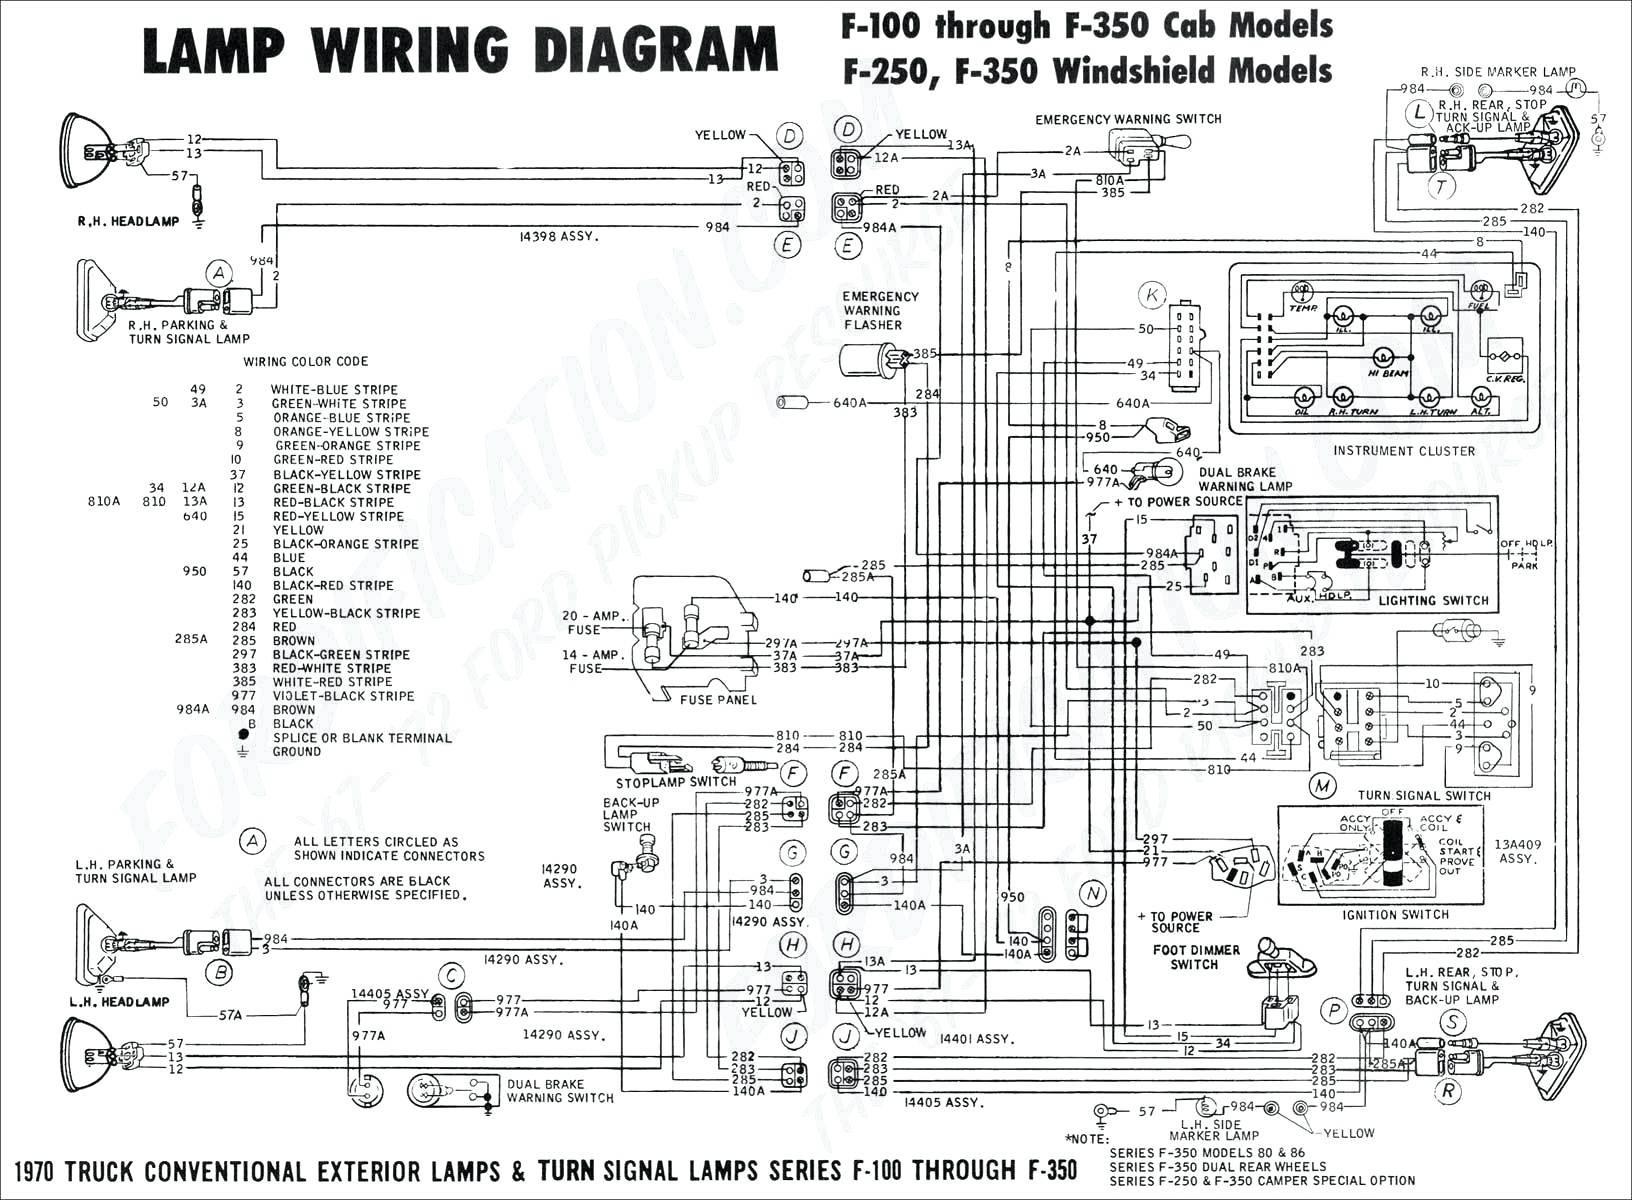 2004 Chrysler Sebring 2 7 Engine Diagram 2004 Chrysler Pacifica Wiring Diagram Simple 1997 Blue Bird Wiring Of 2004 Chrysler Sebring 2 7 Engine Diagram